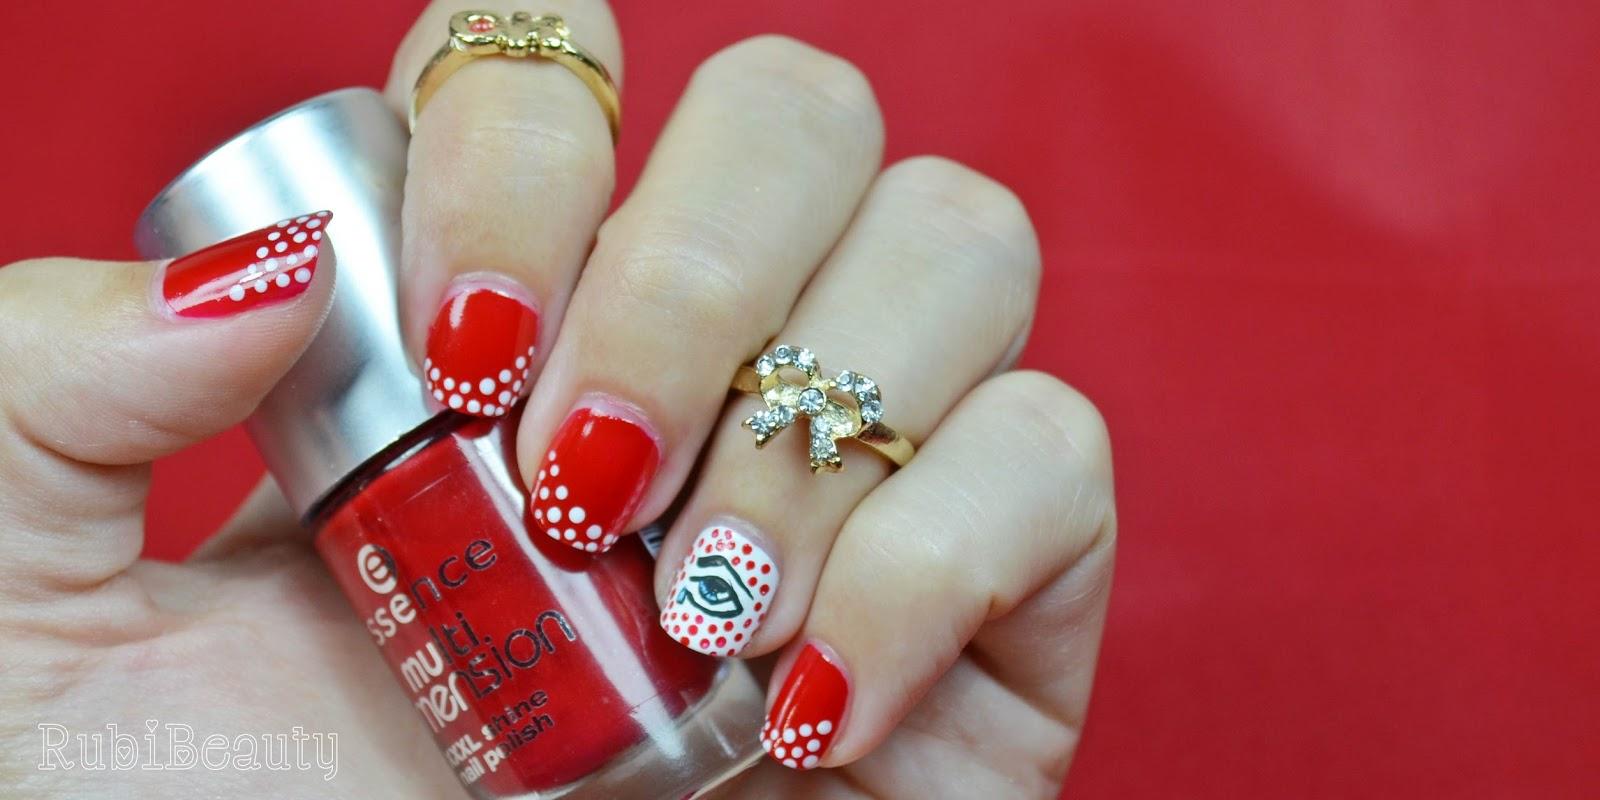 nail art diseños uñas puntos rojo red comic ojo horus it huelva